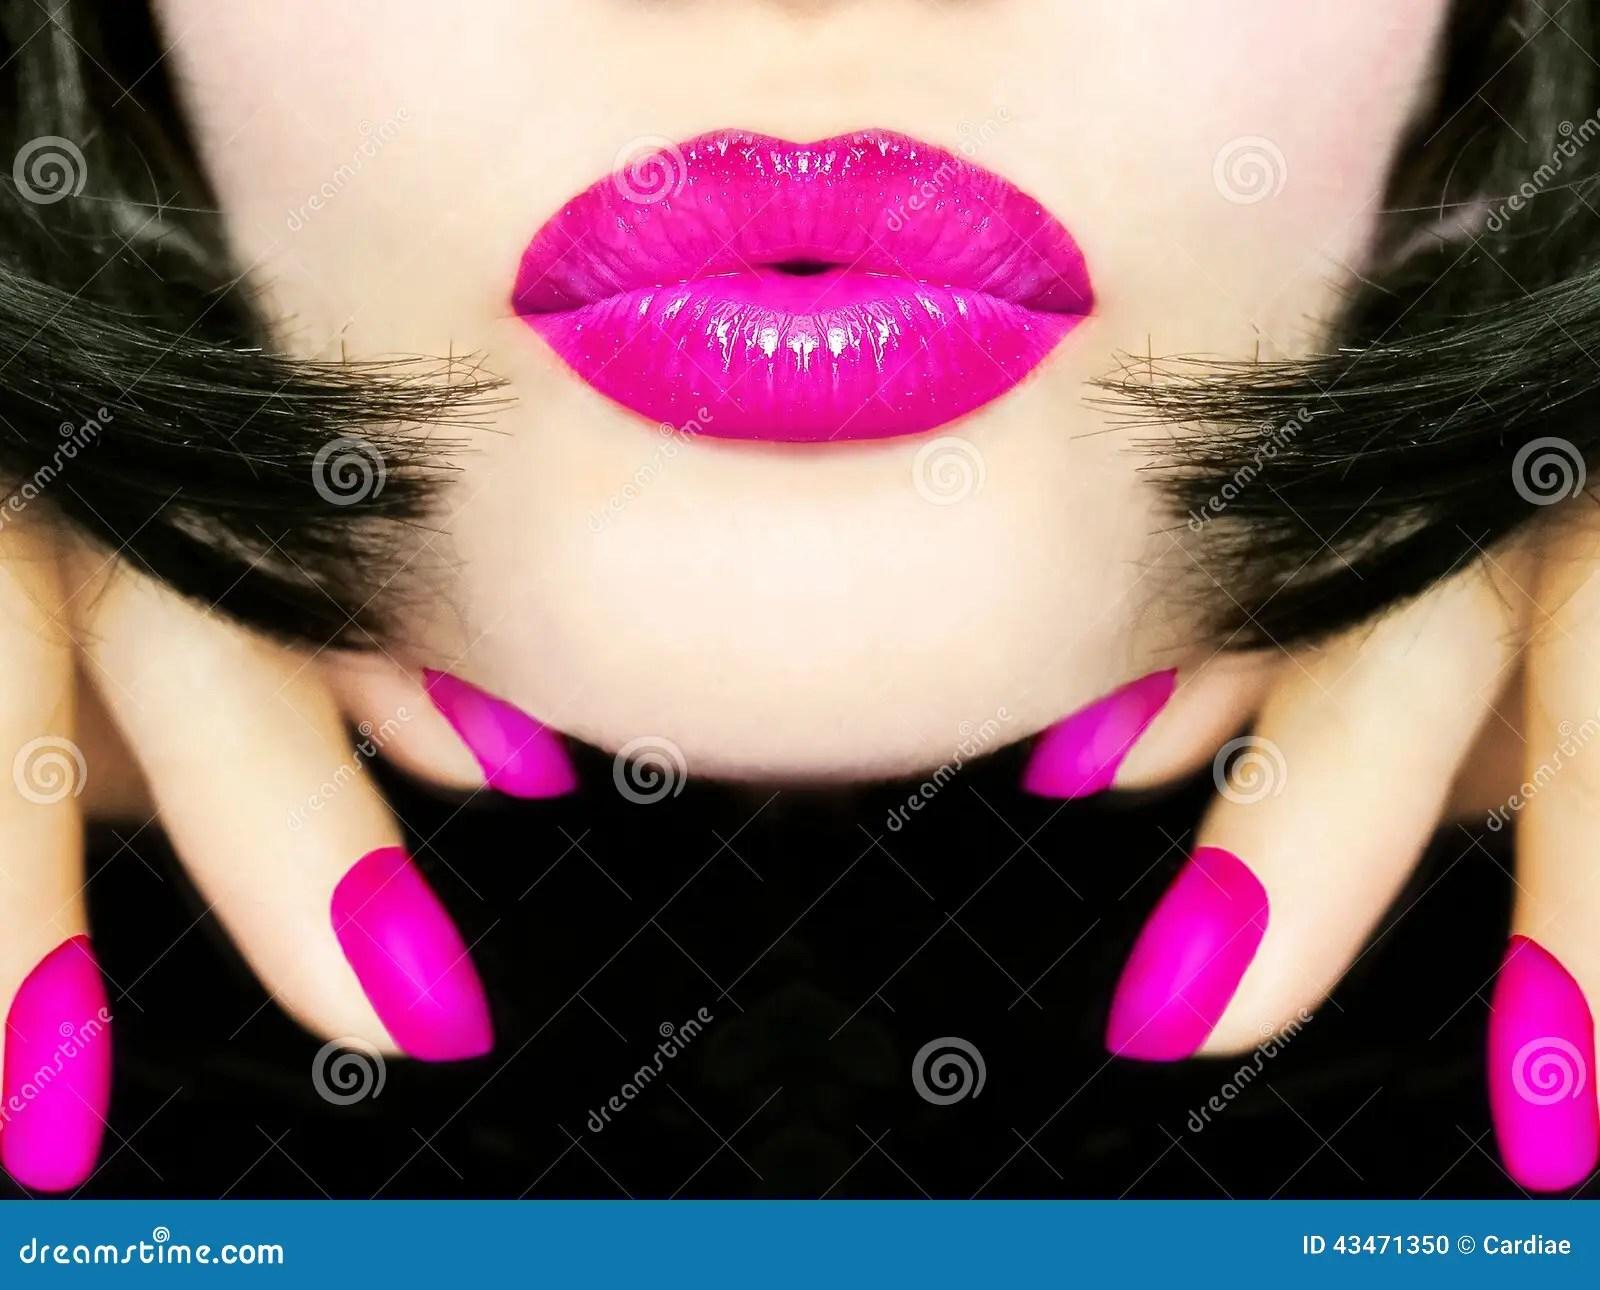 Cute Nail Arts Wallpaper Sexy Pretty Woman With Black Hair Pink Lips Sending Kiss